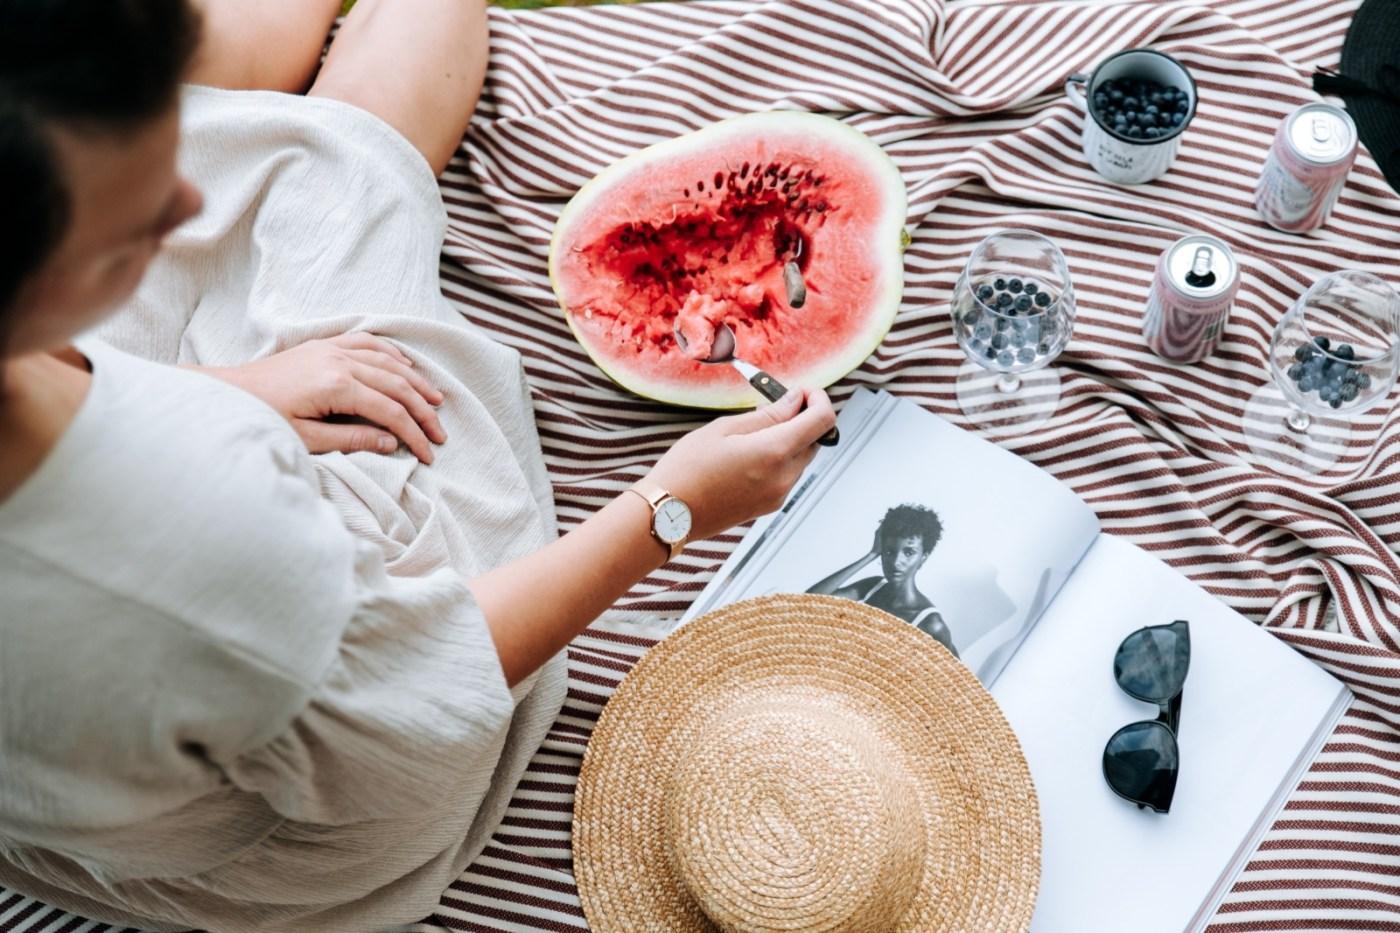 woman slicing watermelon fruit